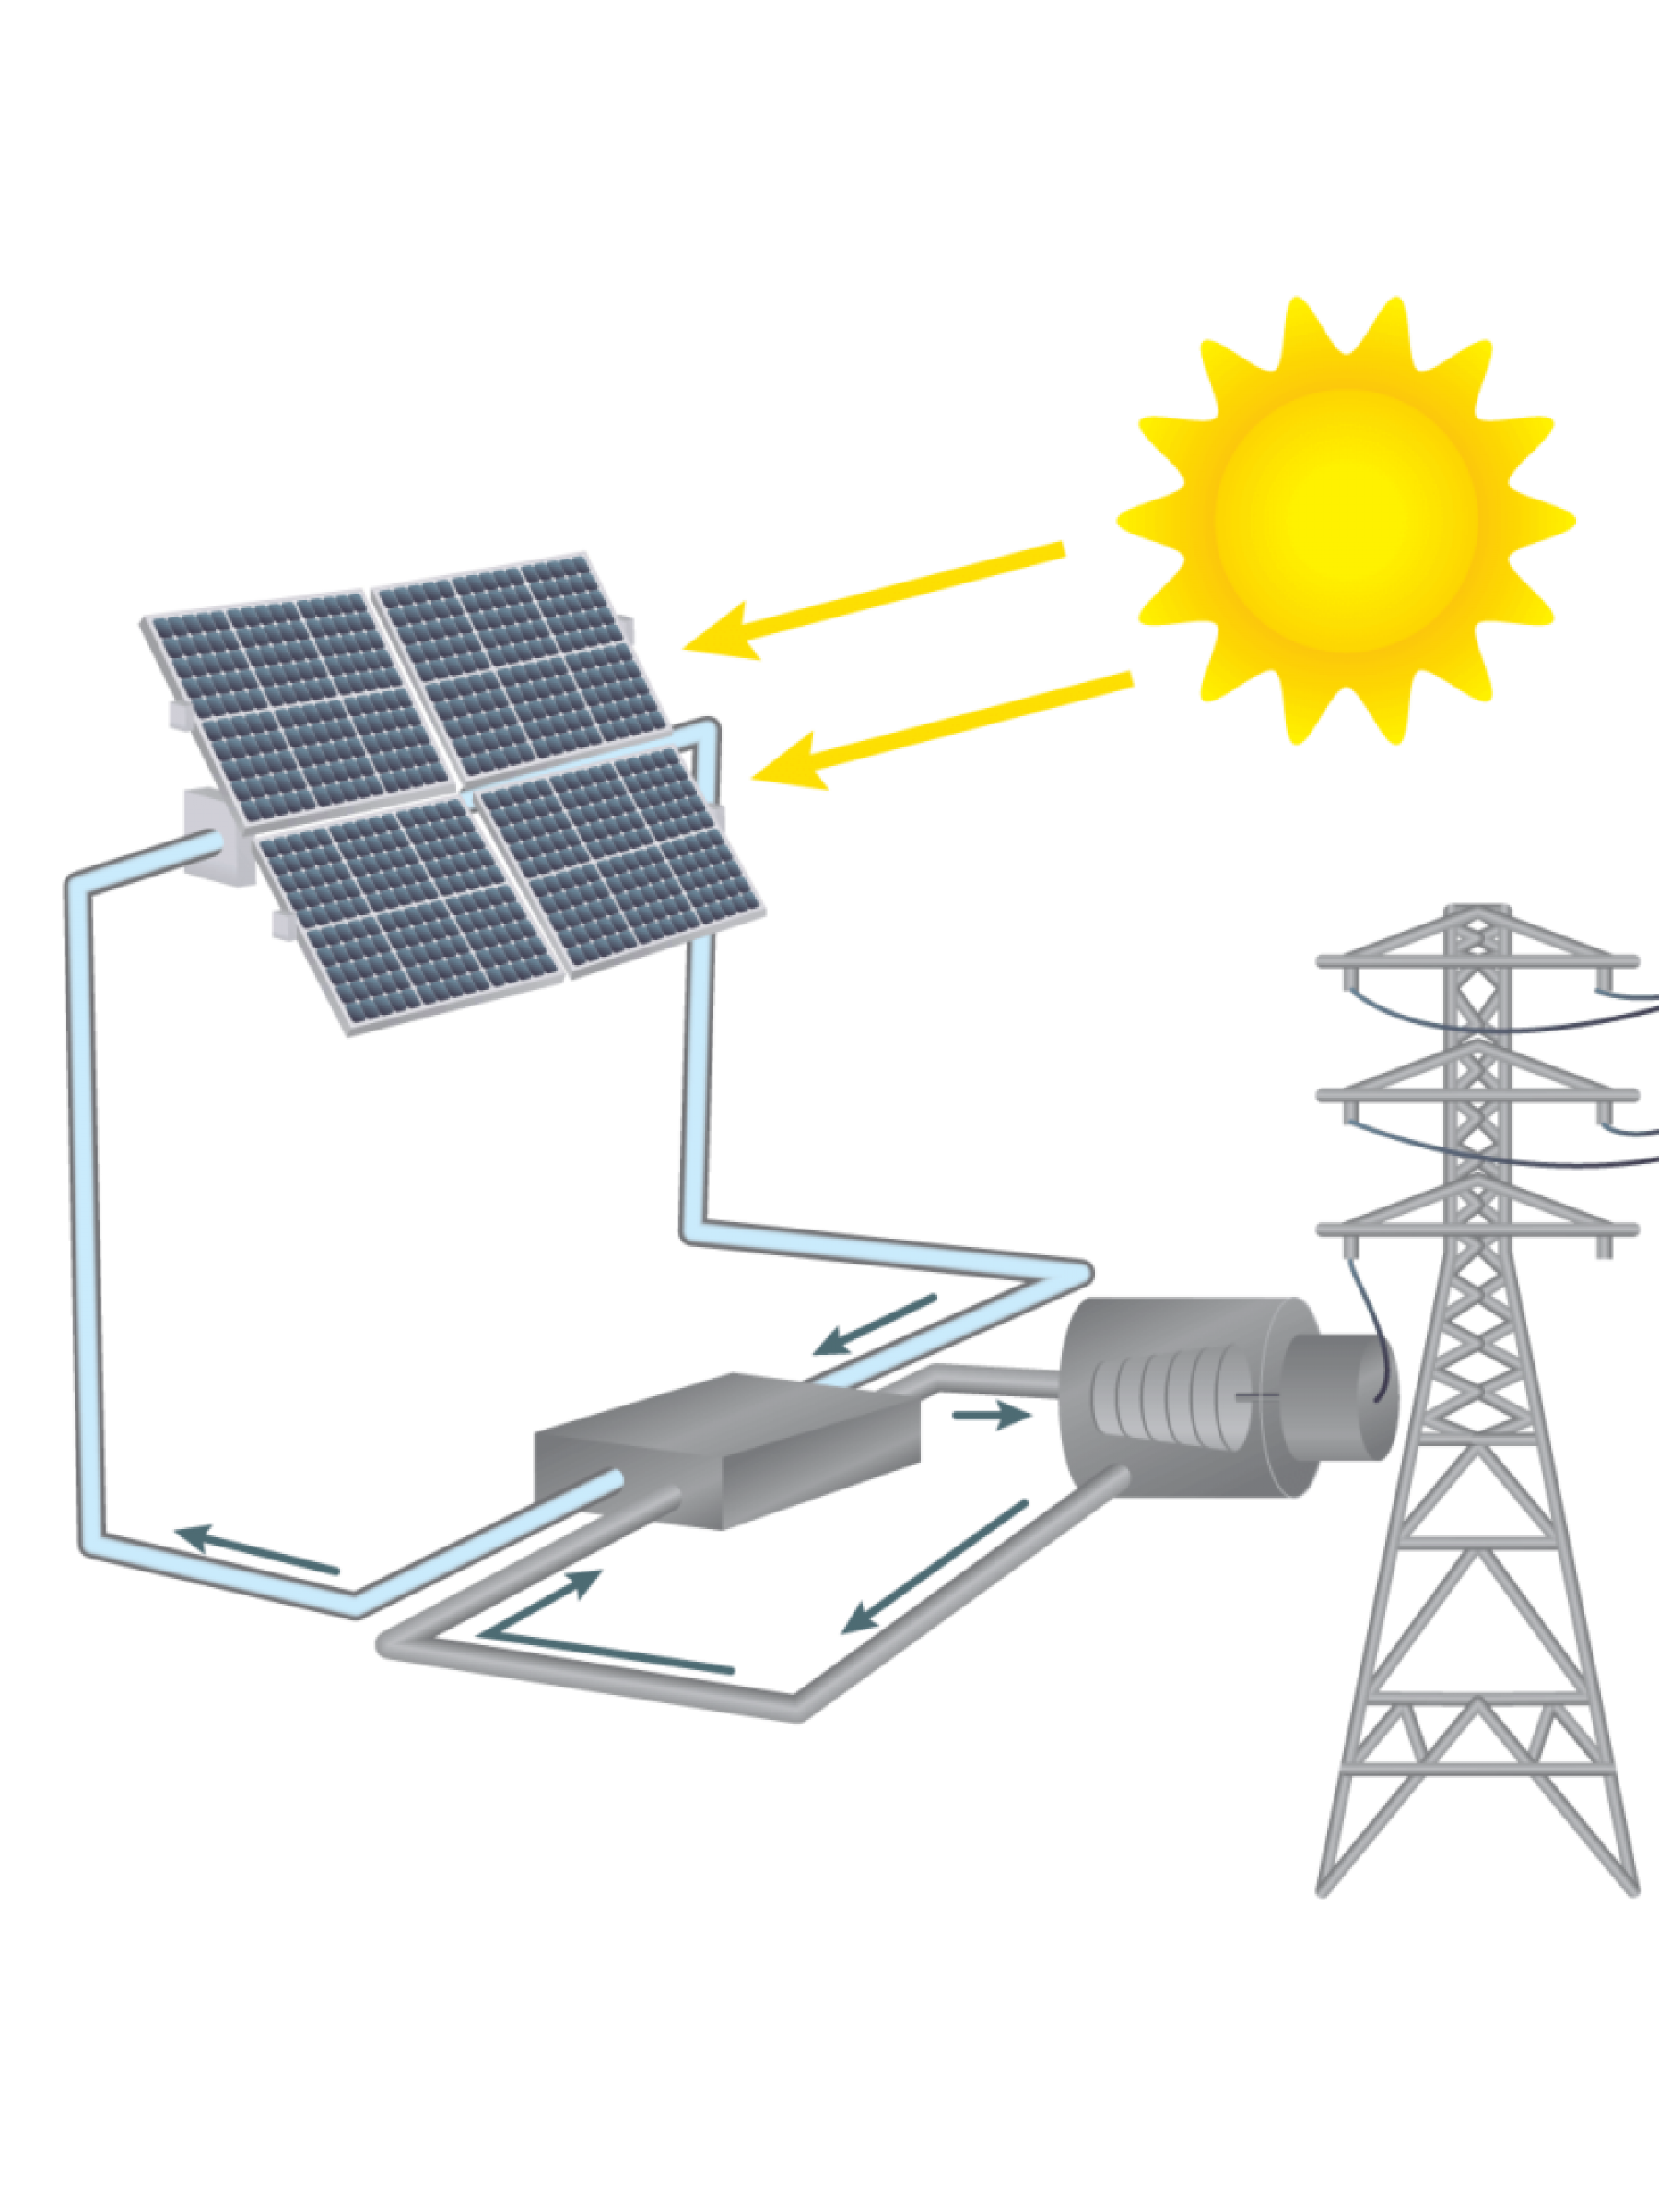 Energy Transformations Robot Hardware Kit